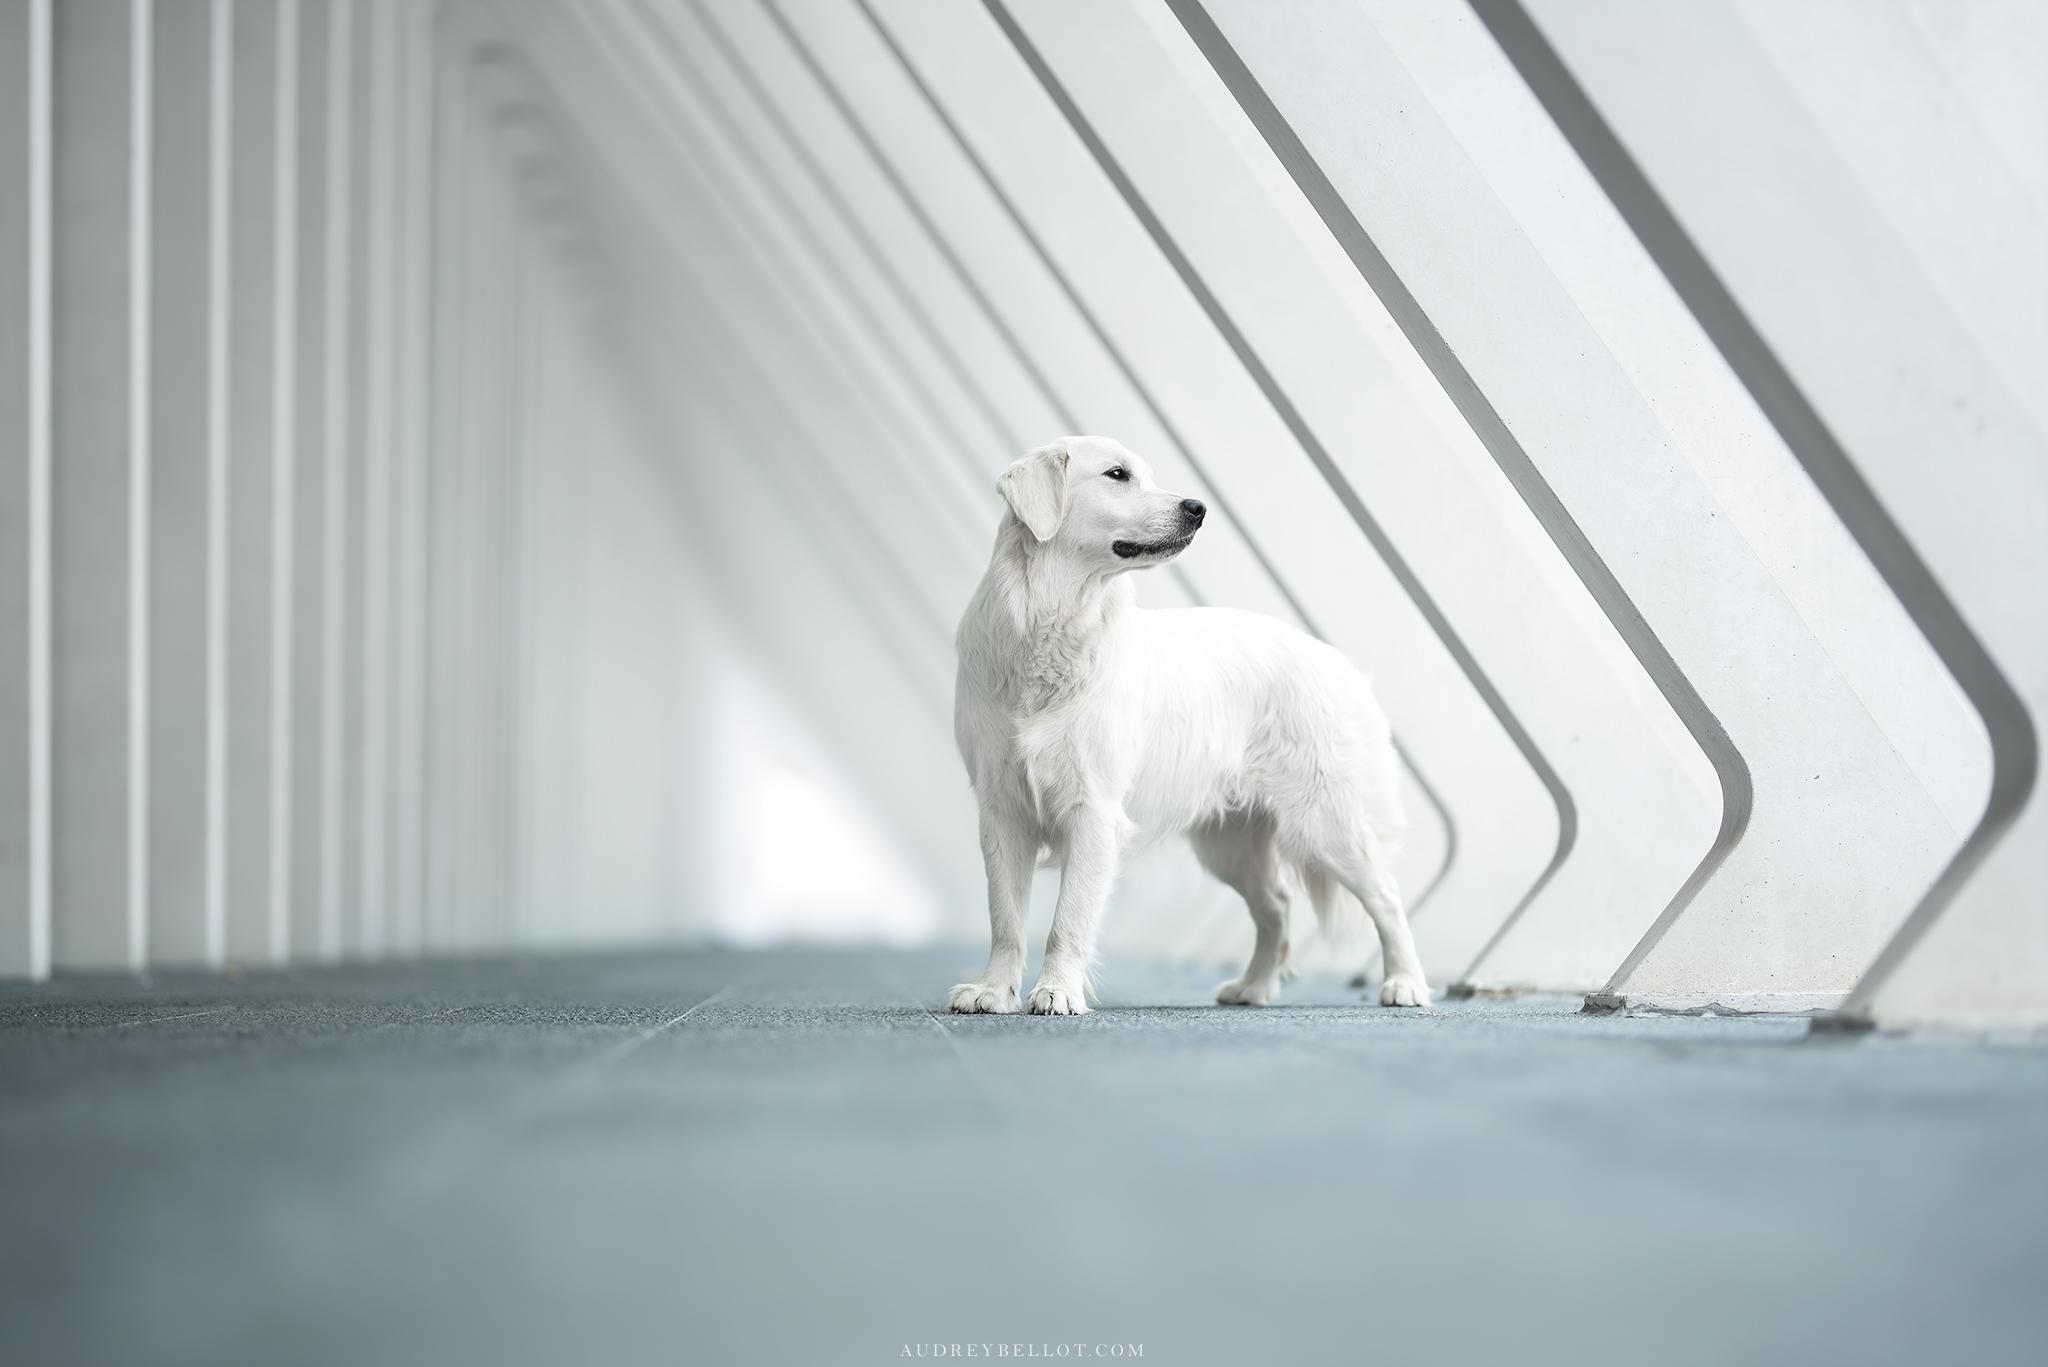 Golden Retriever Audrey Bellot Photographe Canin Professionnel Auvergne My Best Dog Photos 2019 Dogs Photography Workshops Shootings Nikon Sigma